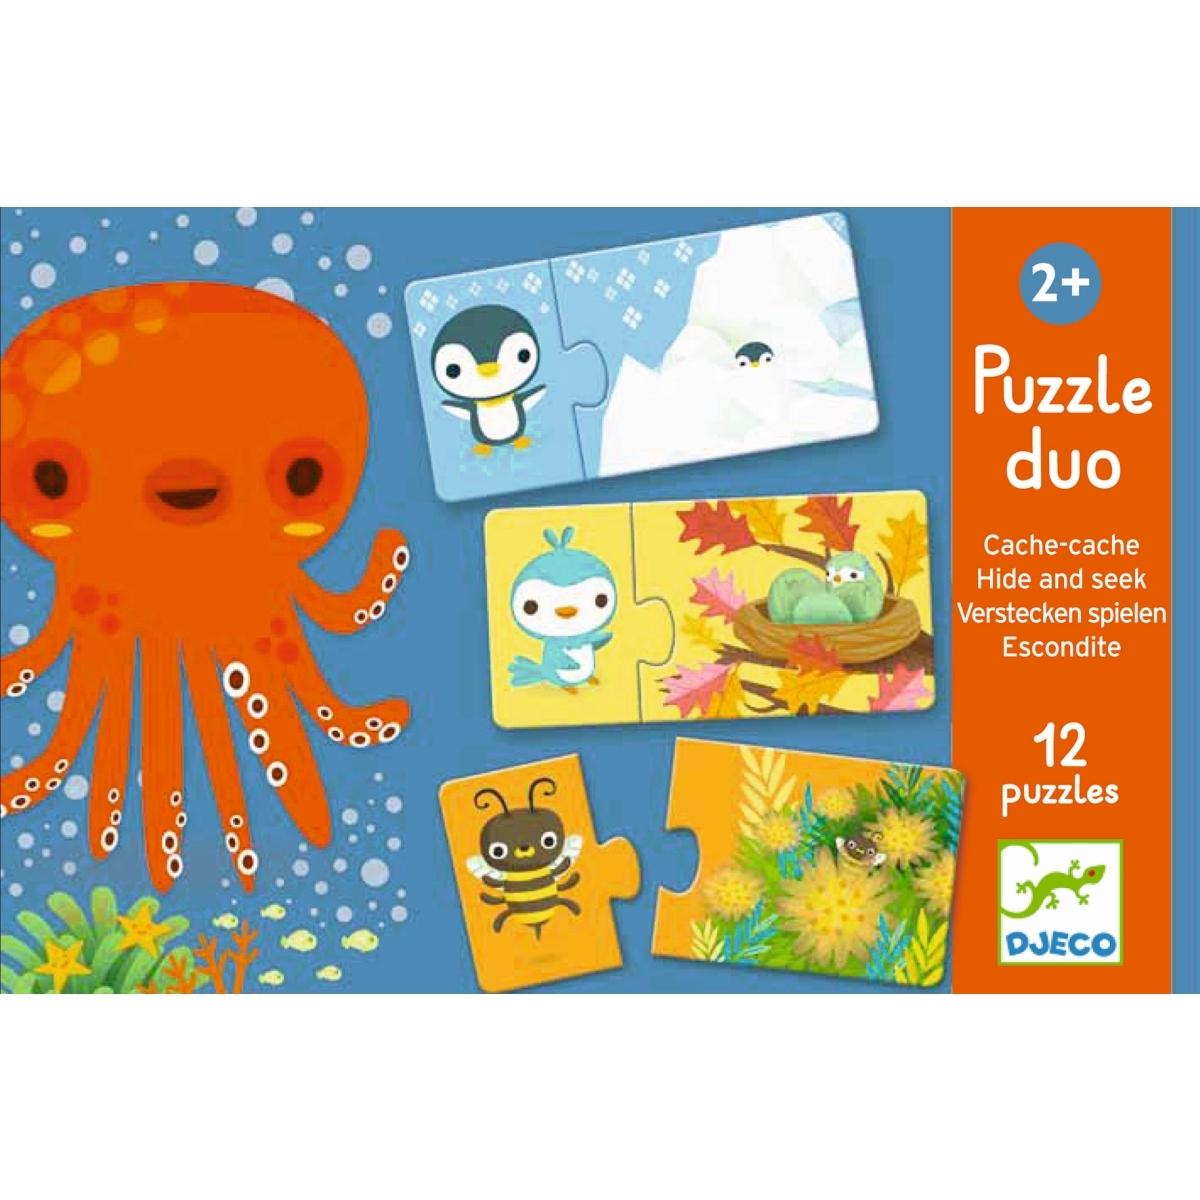 Djeco Puzzle duo Verstecken ab 2 Jahren